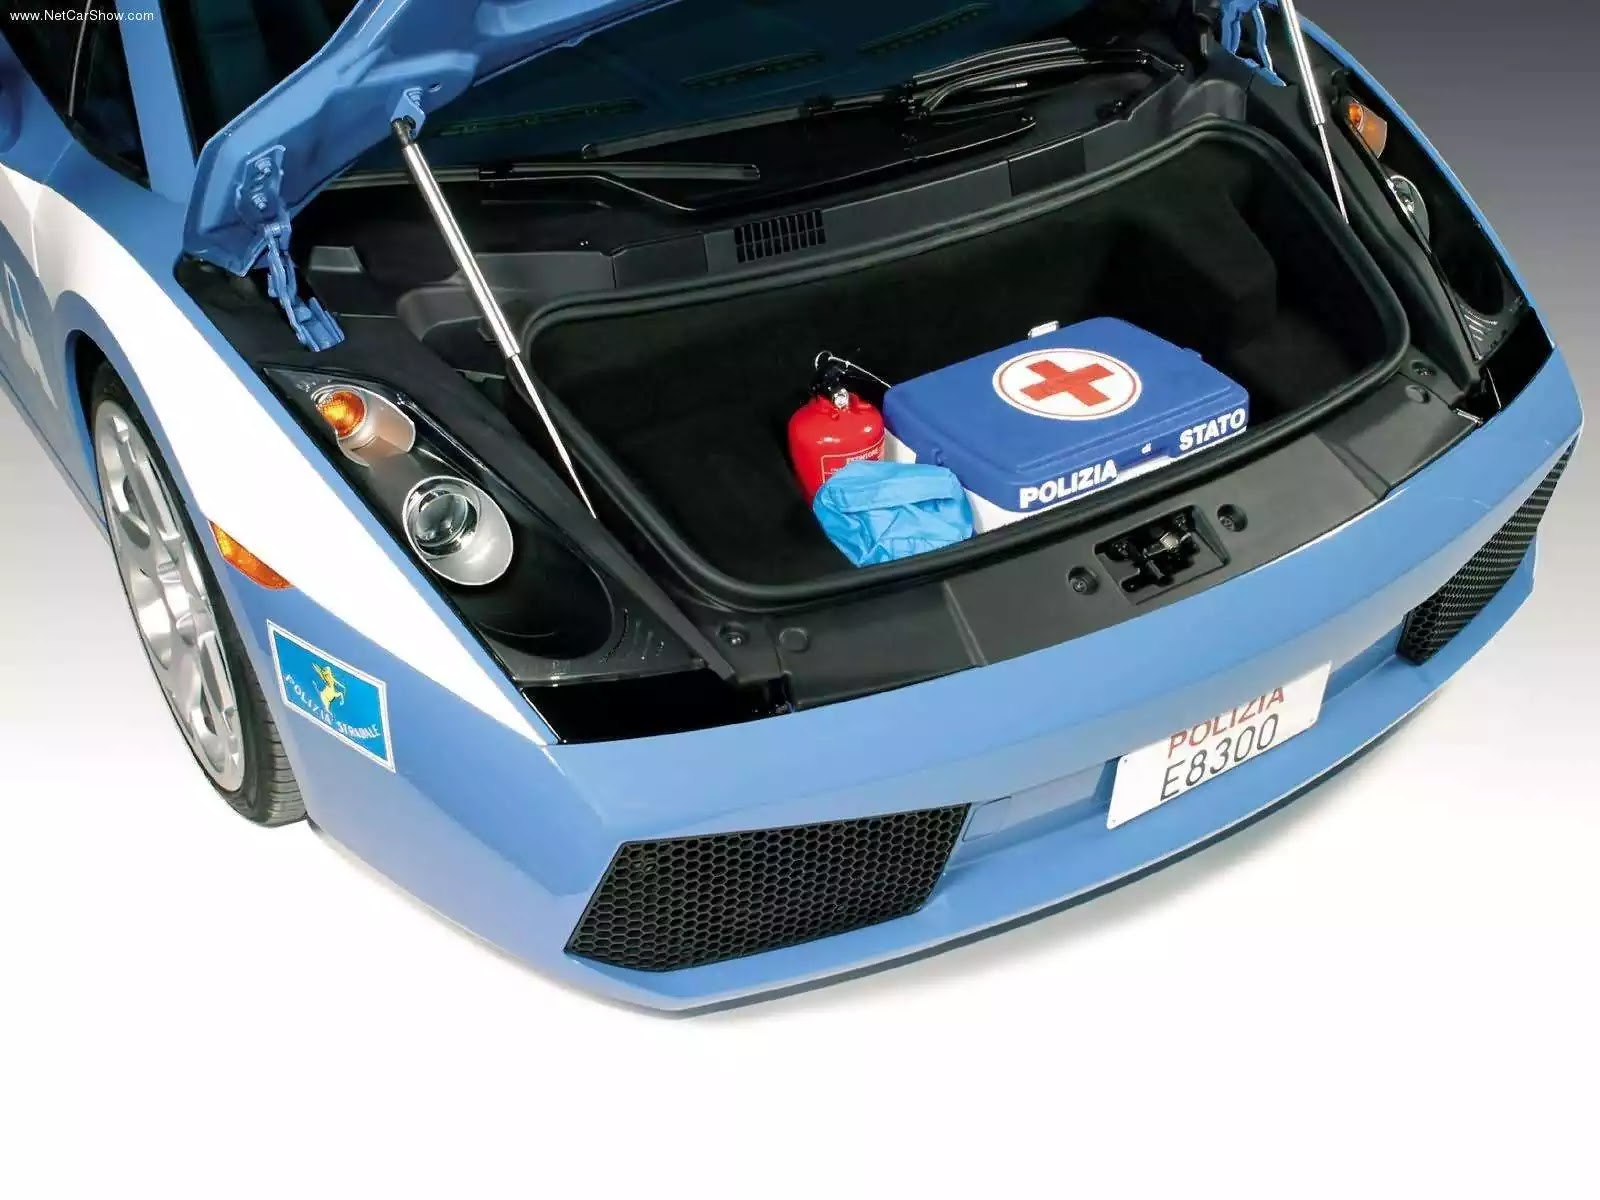 Hình ảnh siêu xe Lamborghini Gallardo Police Car 2004 & nội ngoại thất